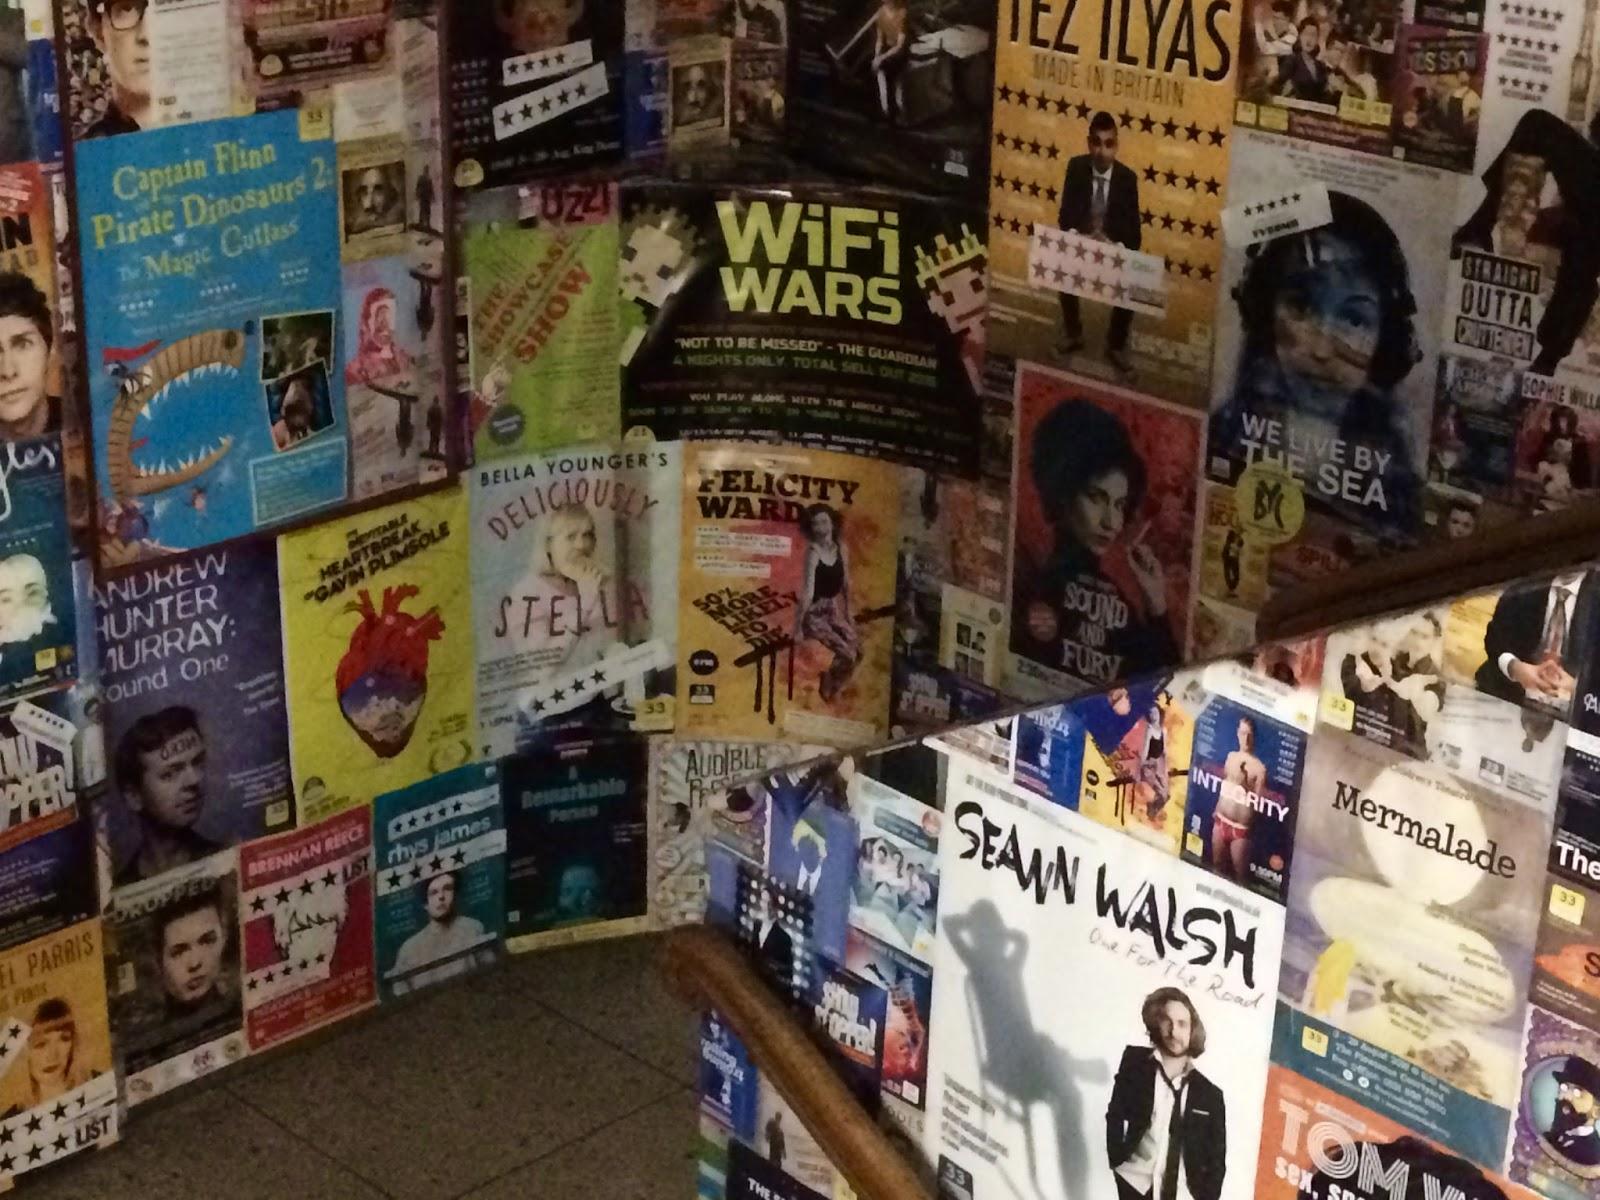 Edinburgh Fringe Posters